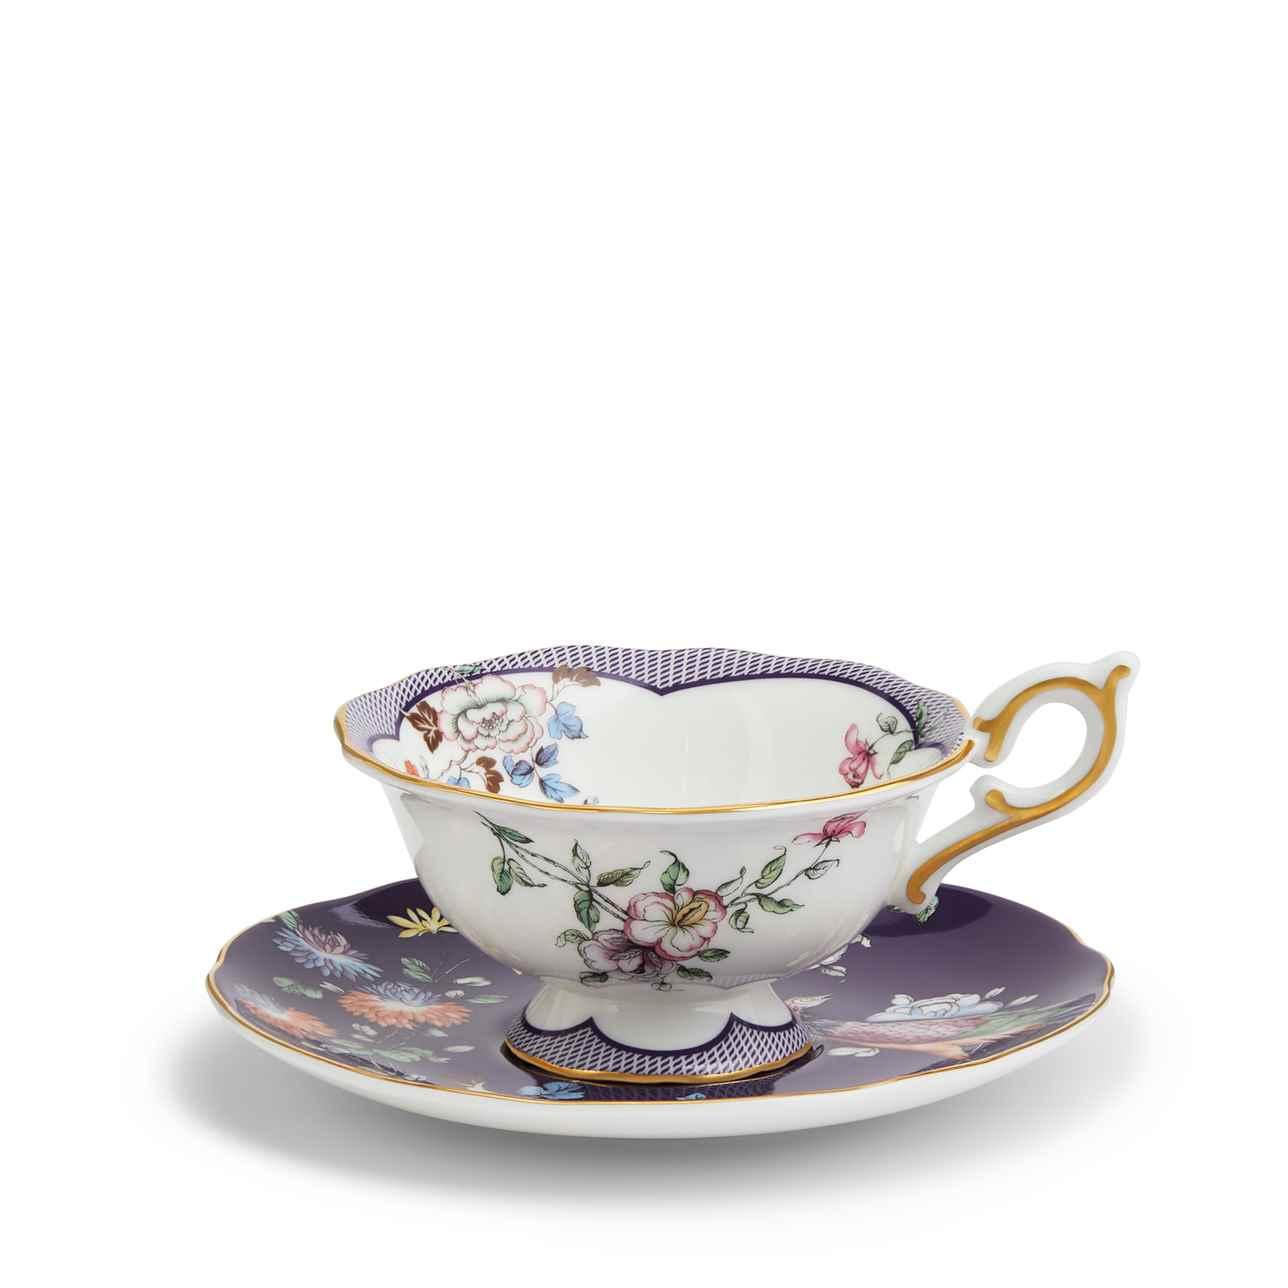 Wonderlust Midnight Crane Teacup and Saucer